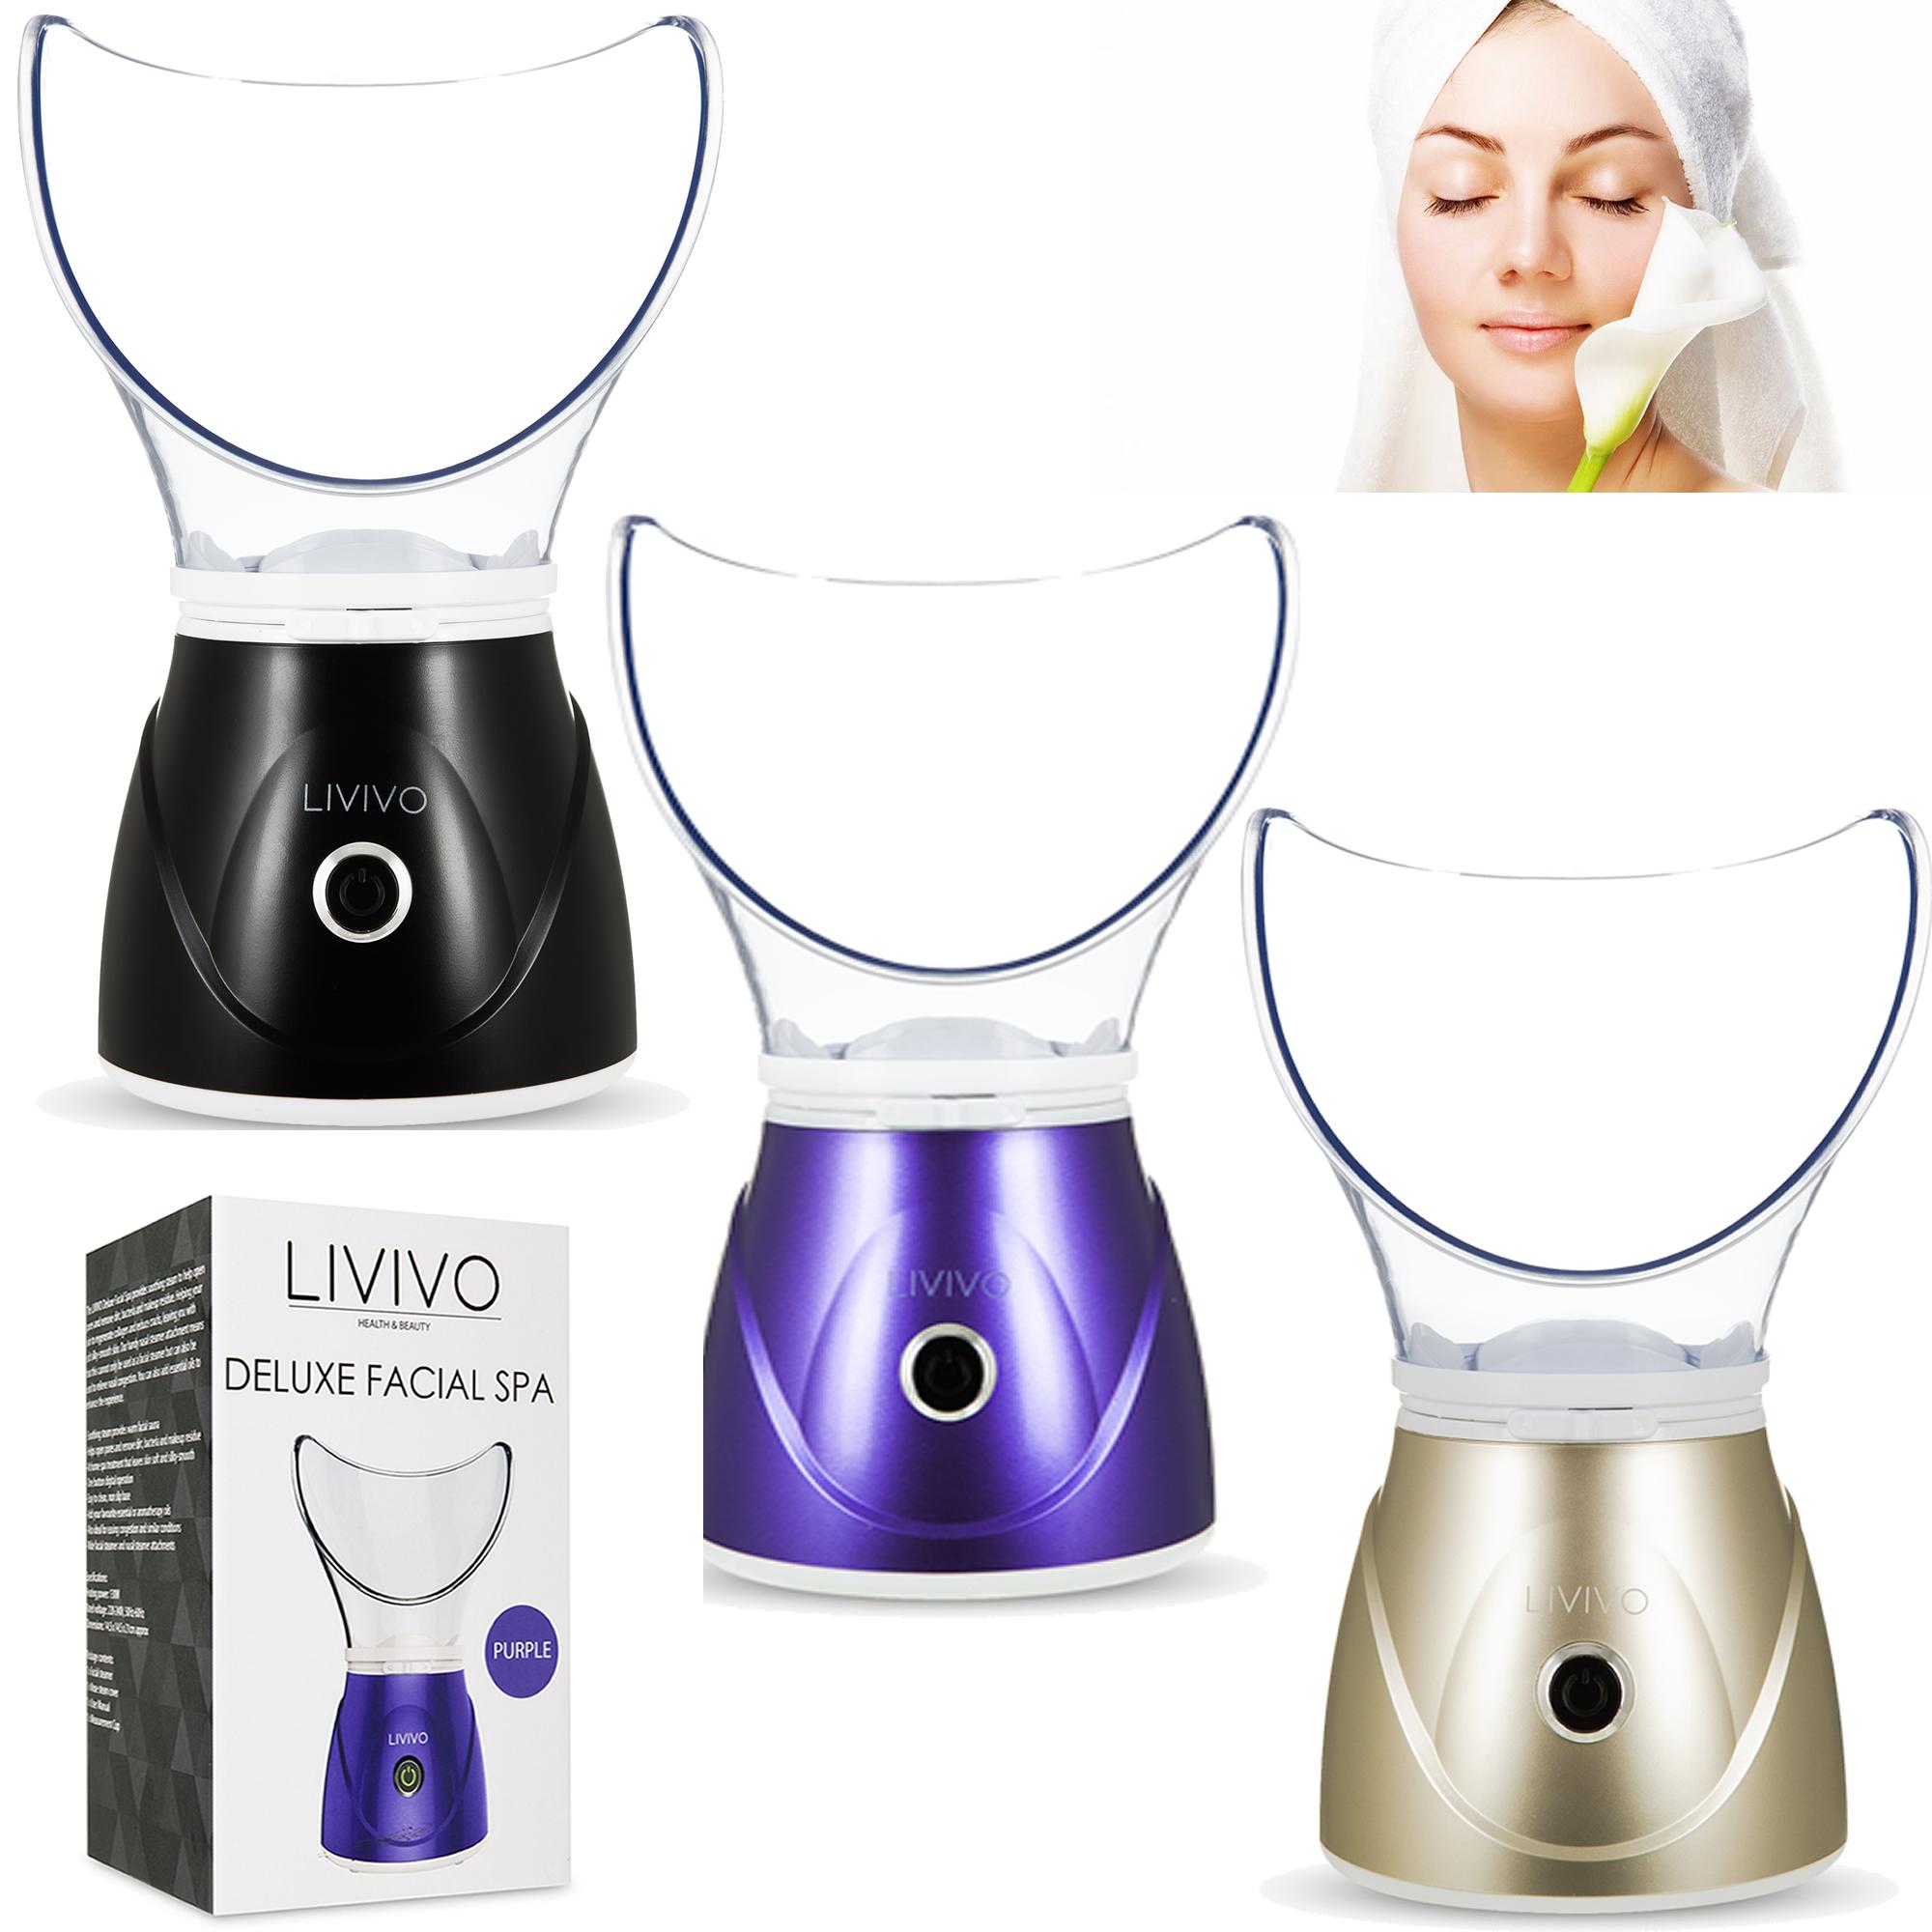 Infrared Vibrating Wet Bath Foot Spa Massager Pedicure